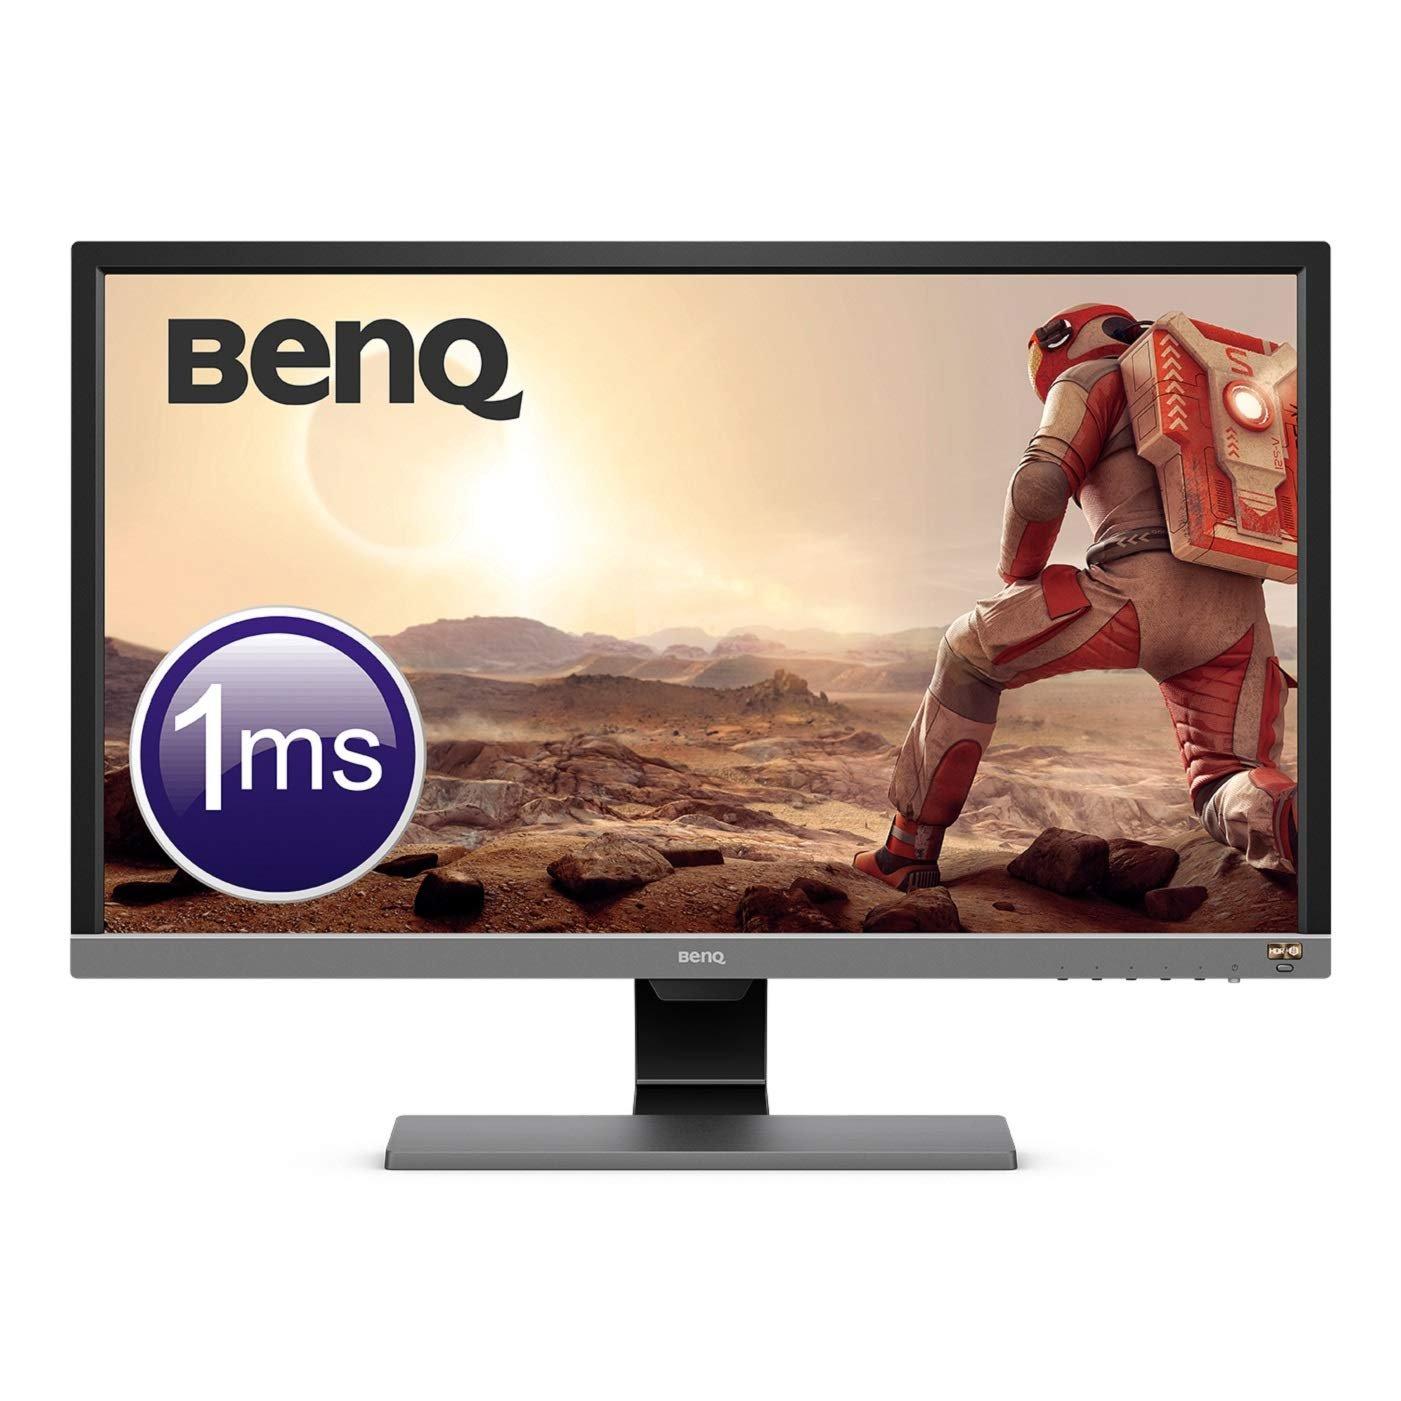 PC Monitor Test